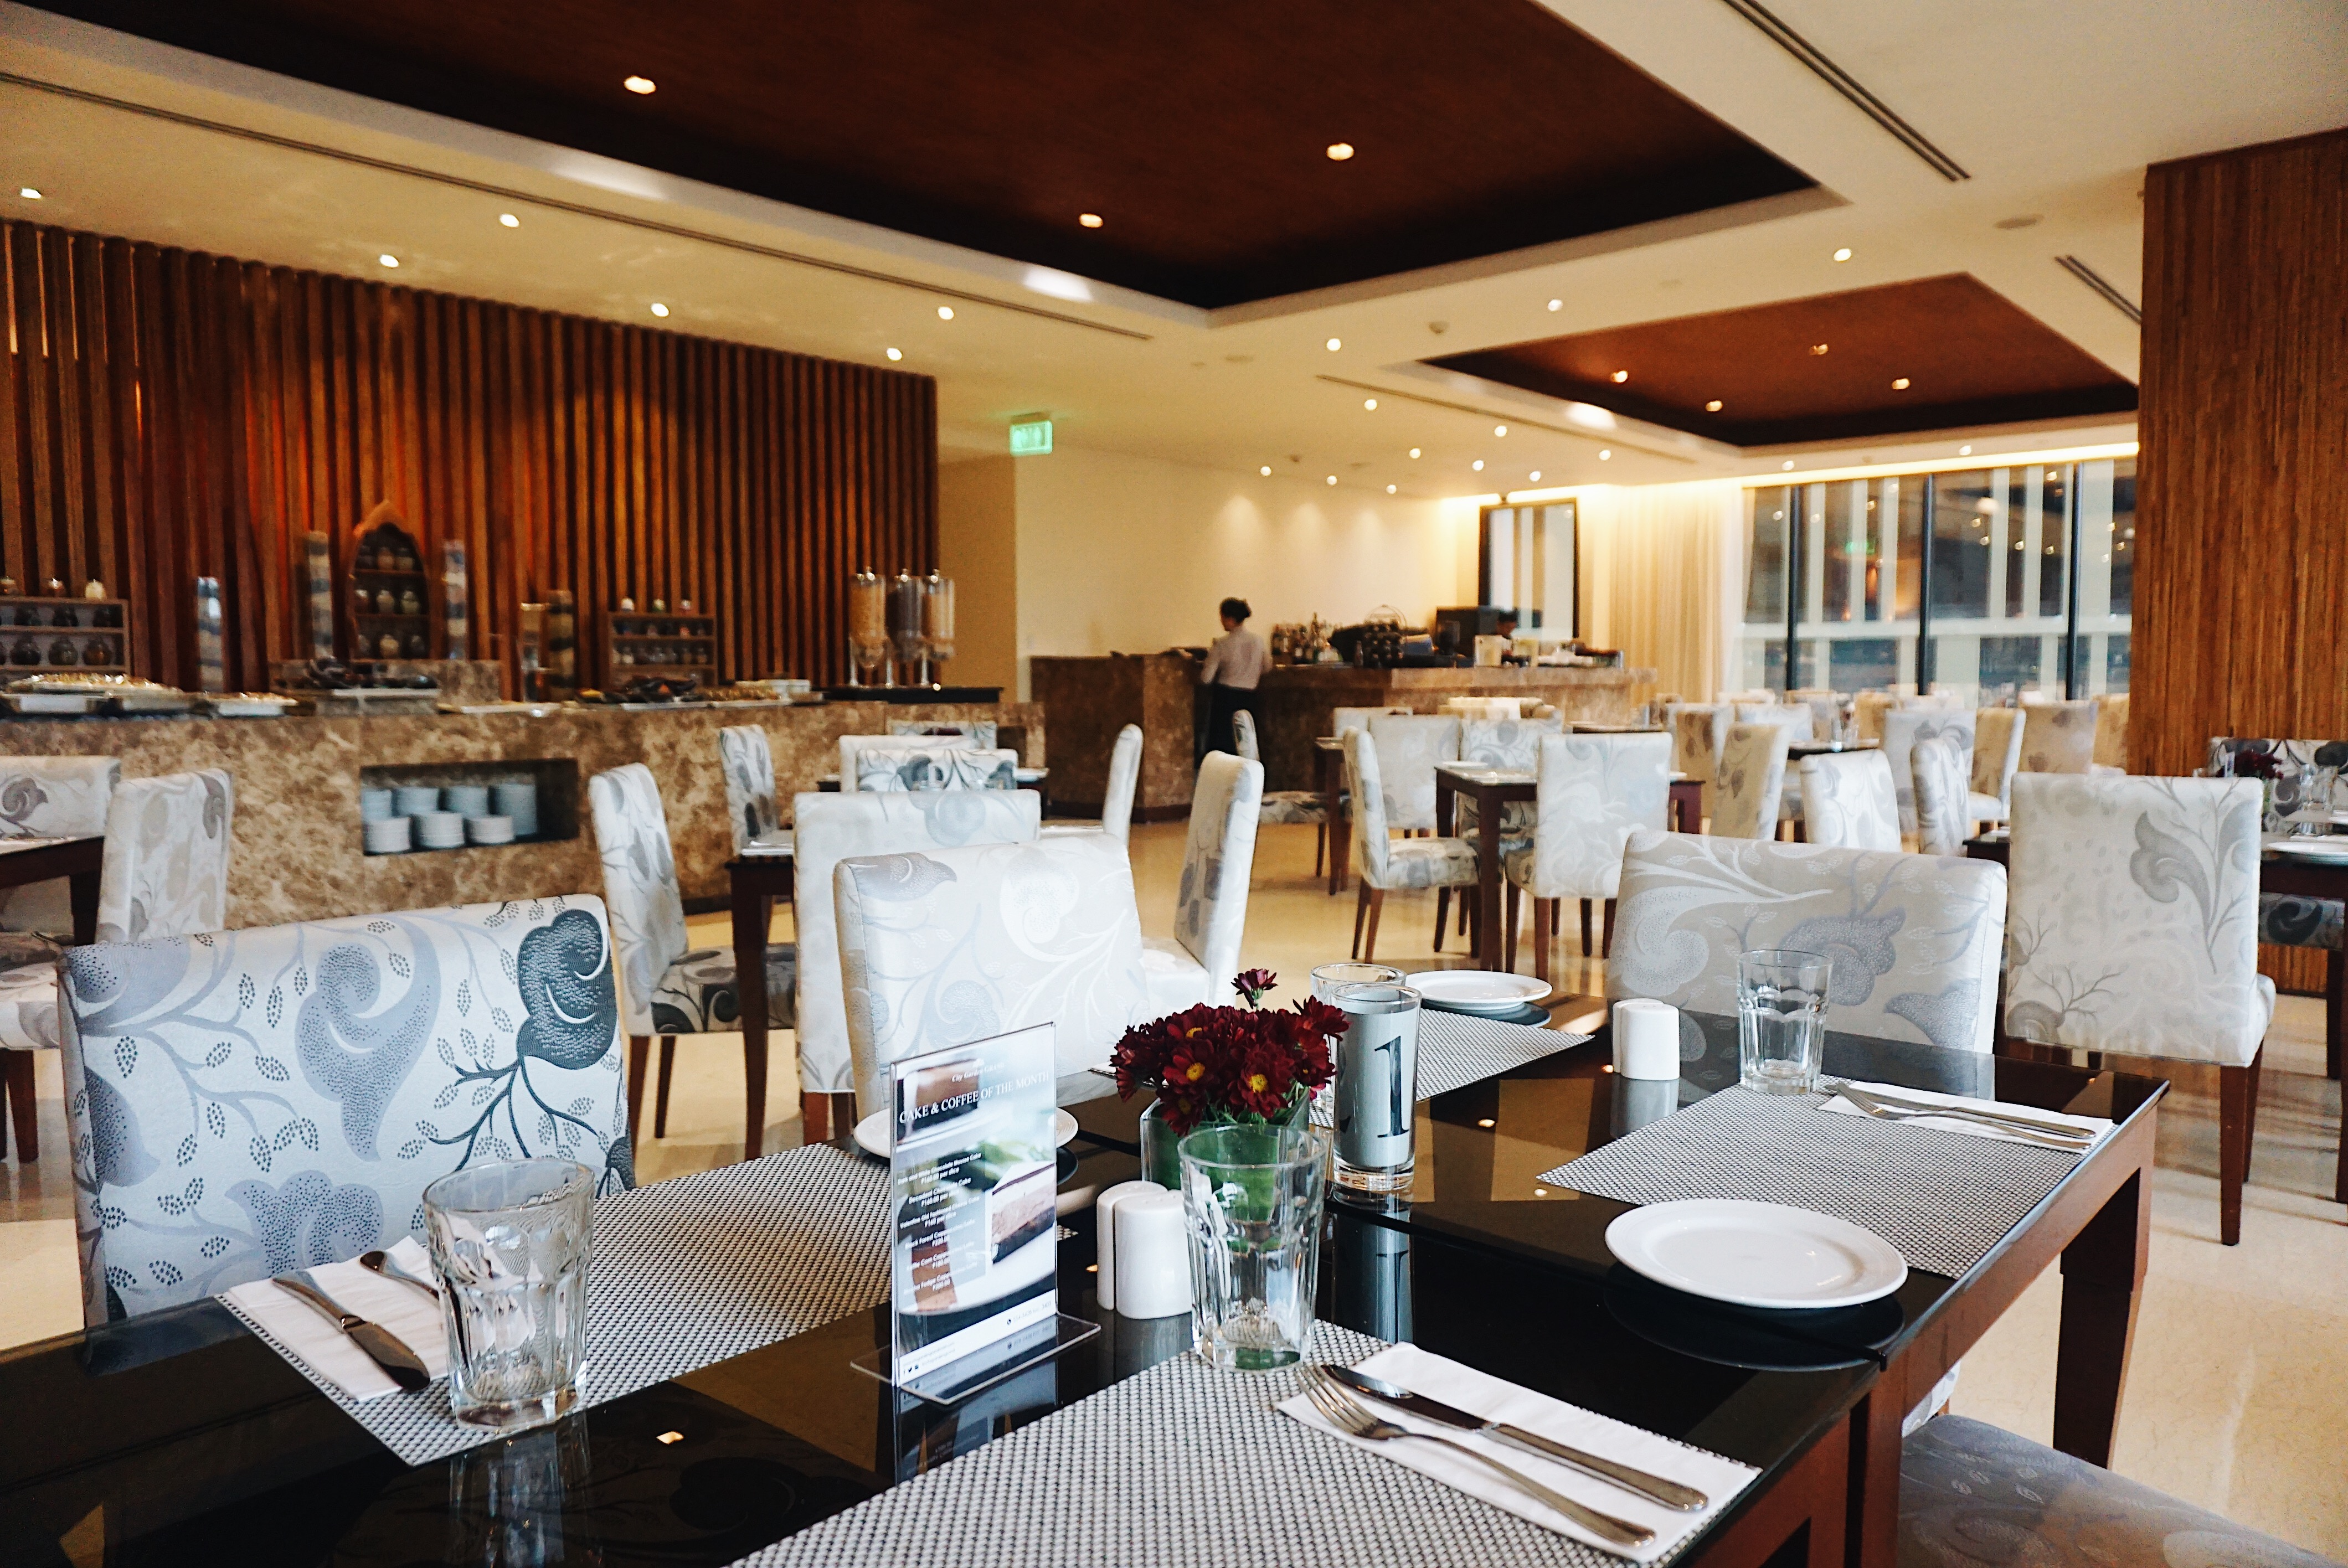 Eatstaycation City Garden Grand Hotel Makati City